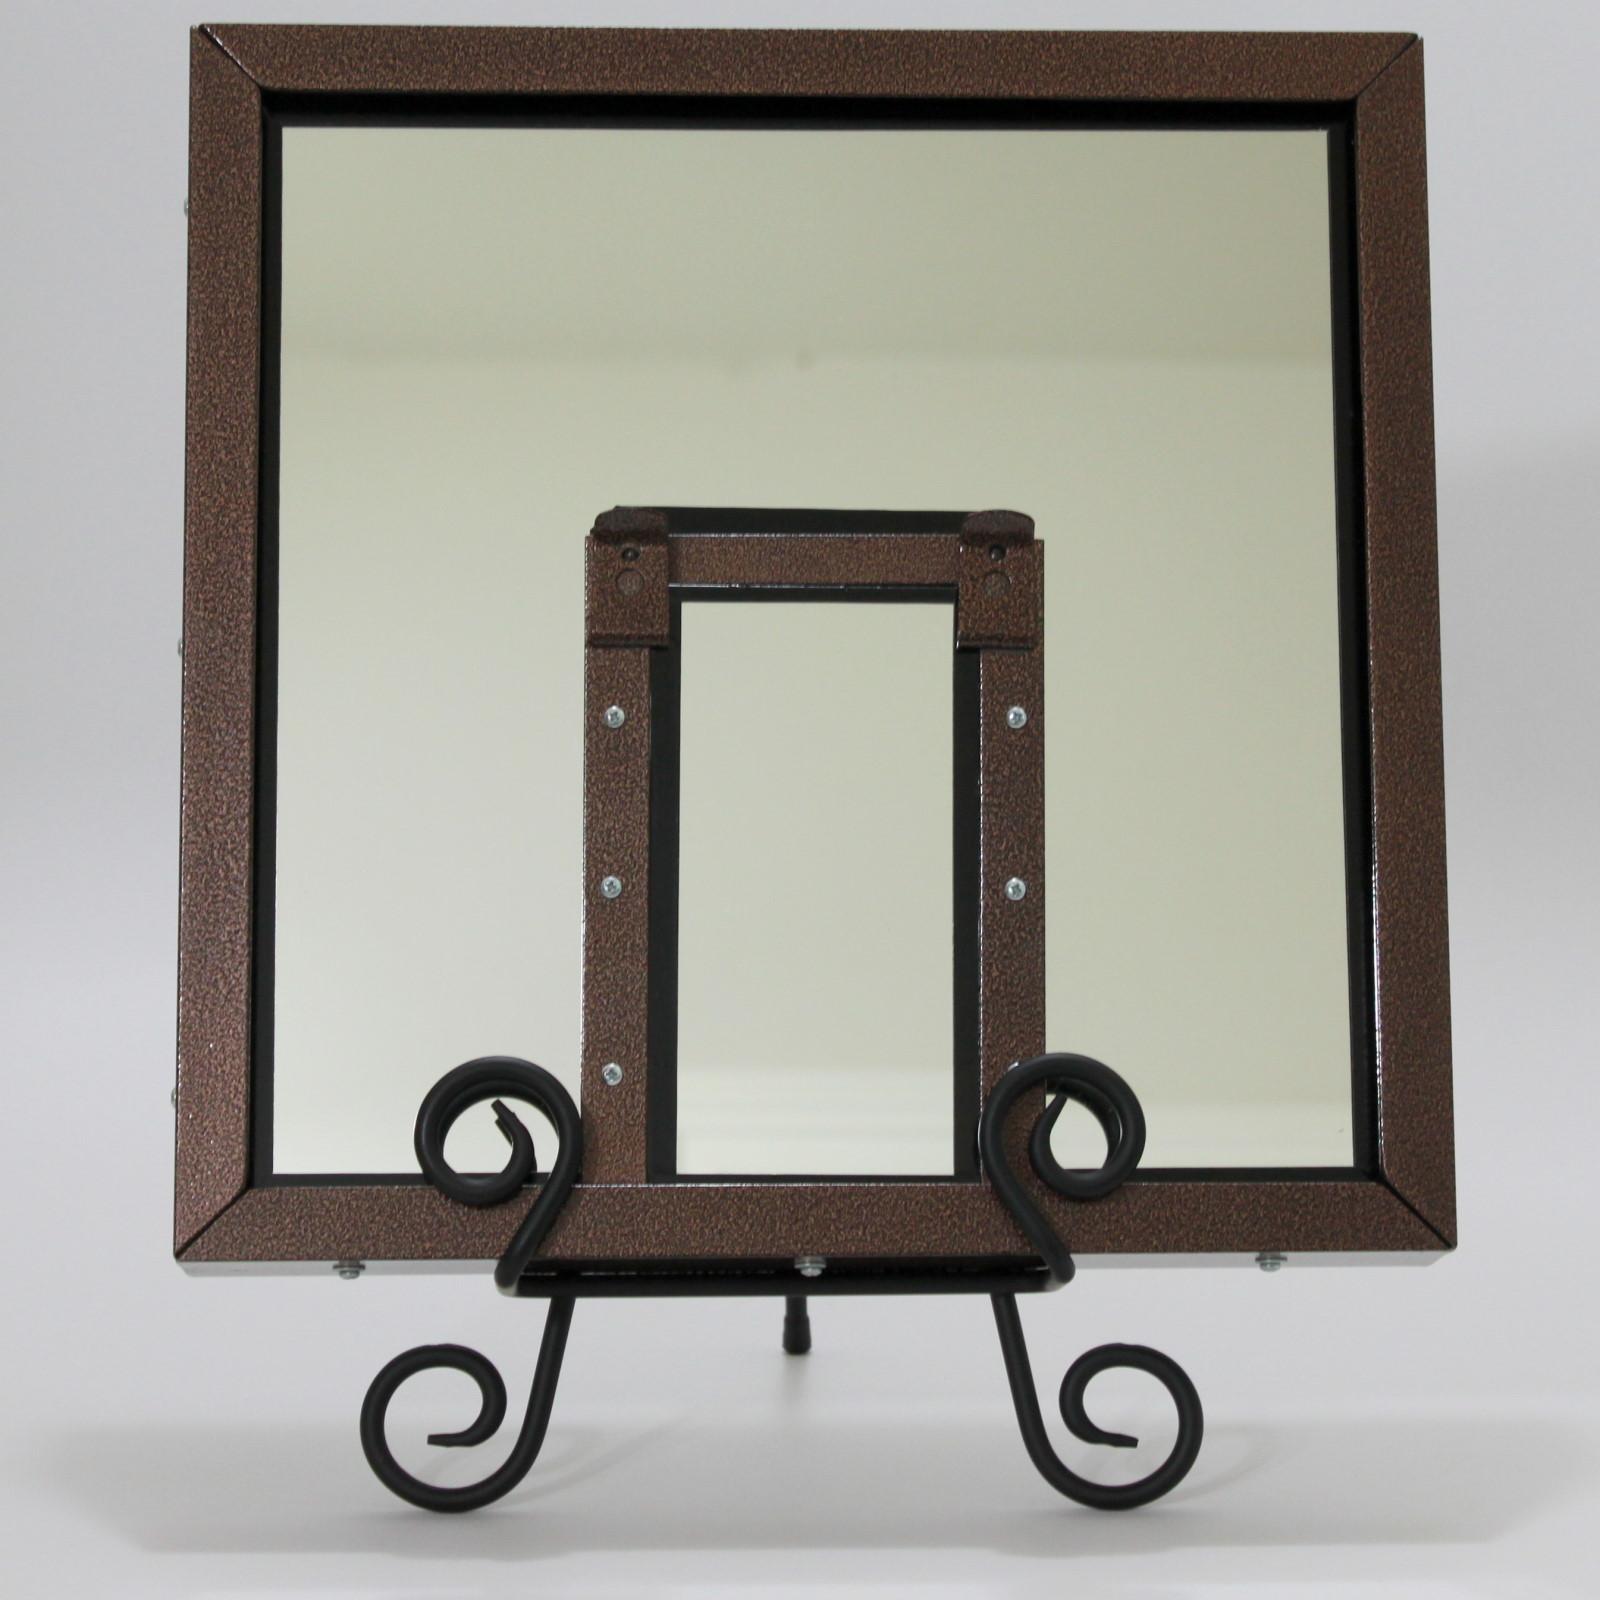 Mirror-ly Perplexed by Dave Pavlov